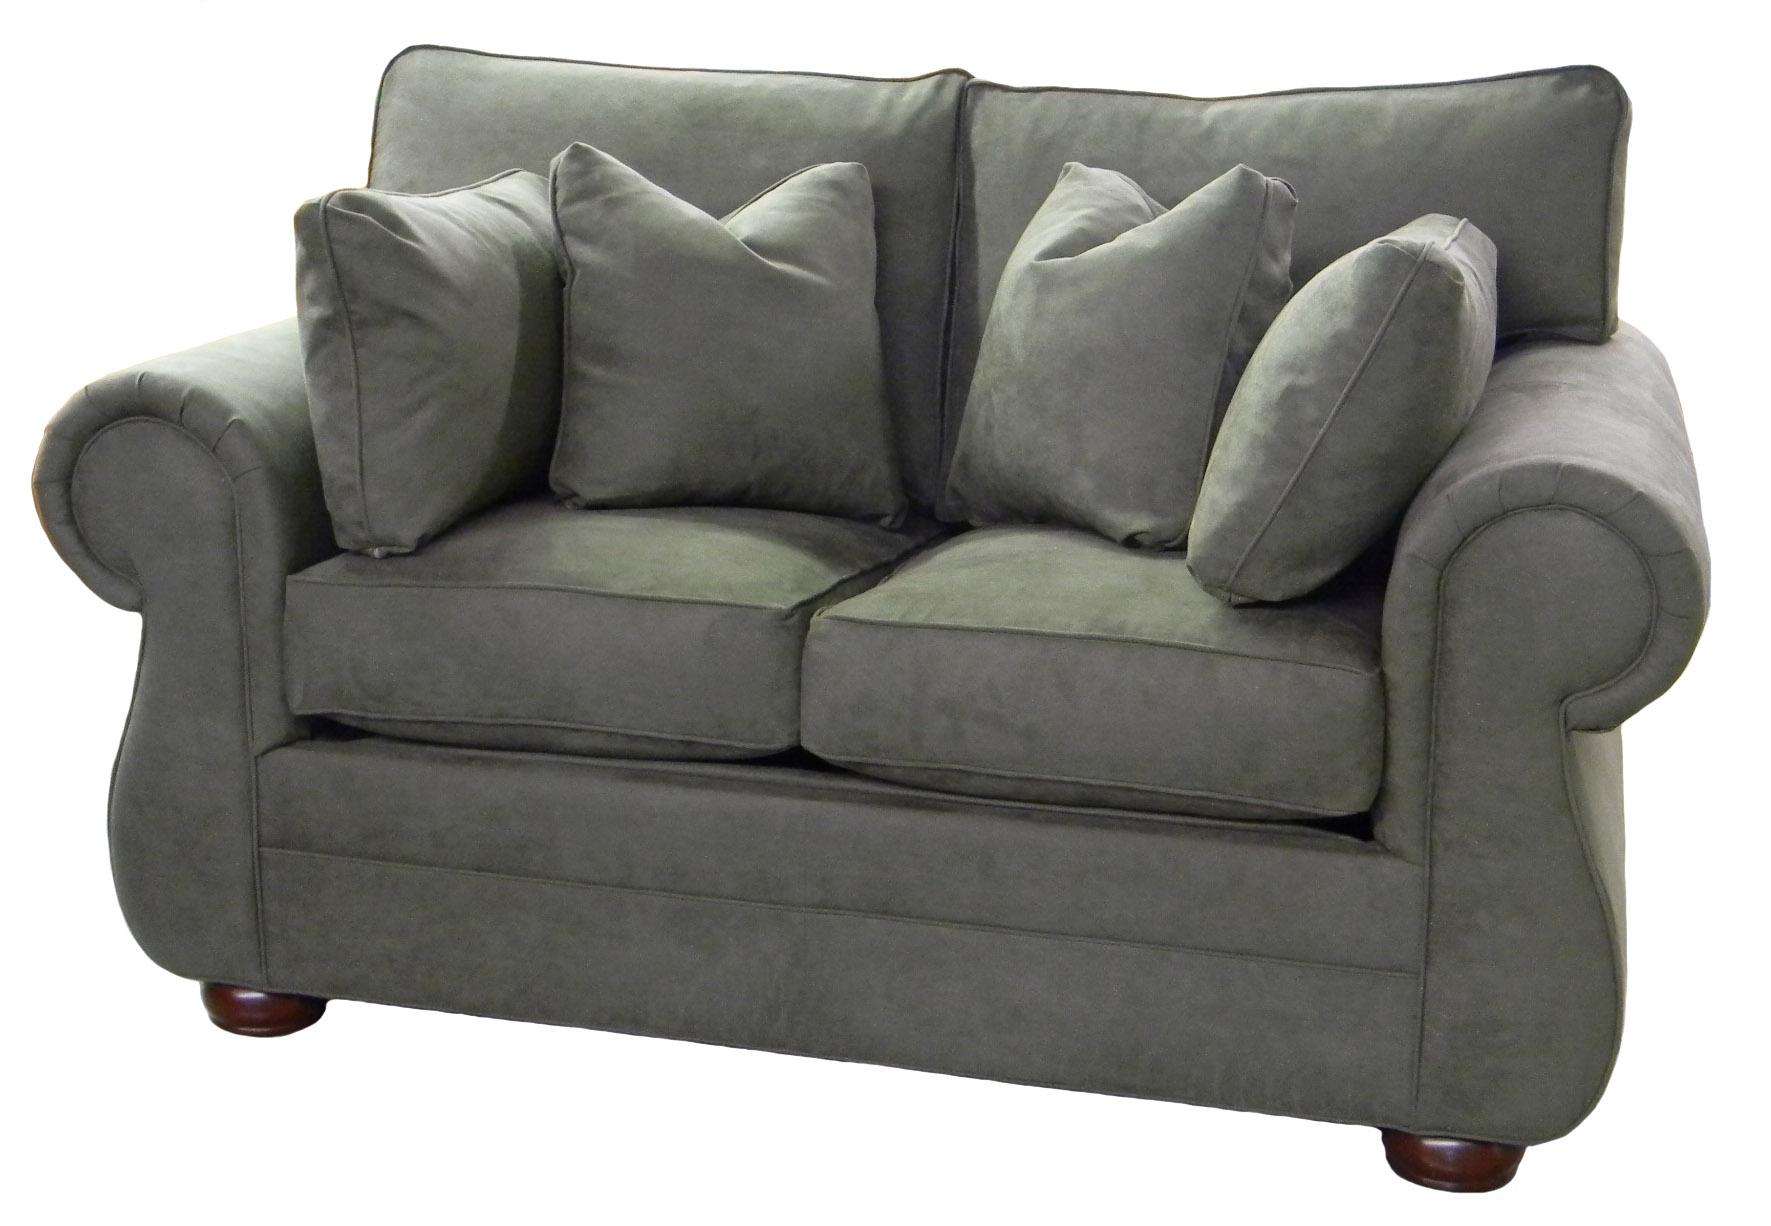 granite and chair innerspring product w twin dansk cream jive tripp mcgregors a furniture winnerspring mattress sleeper half